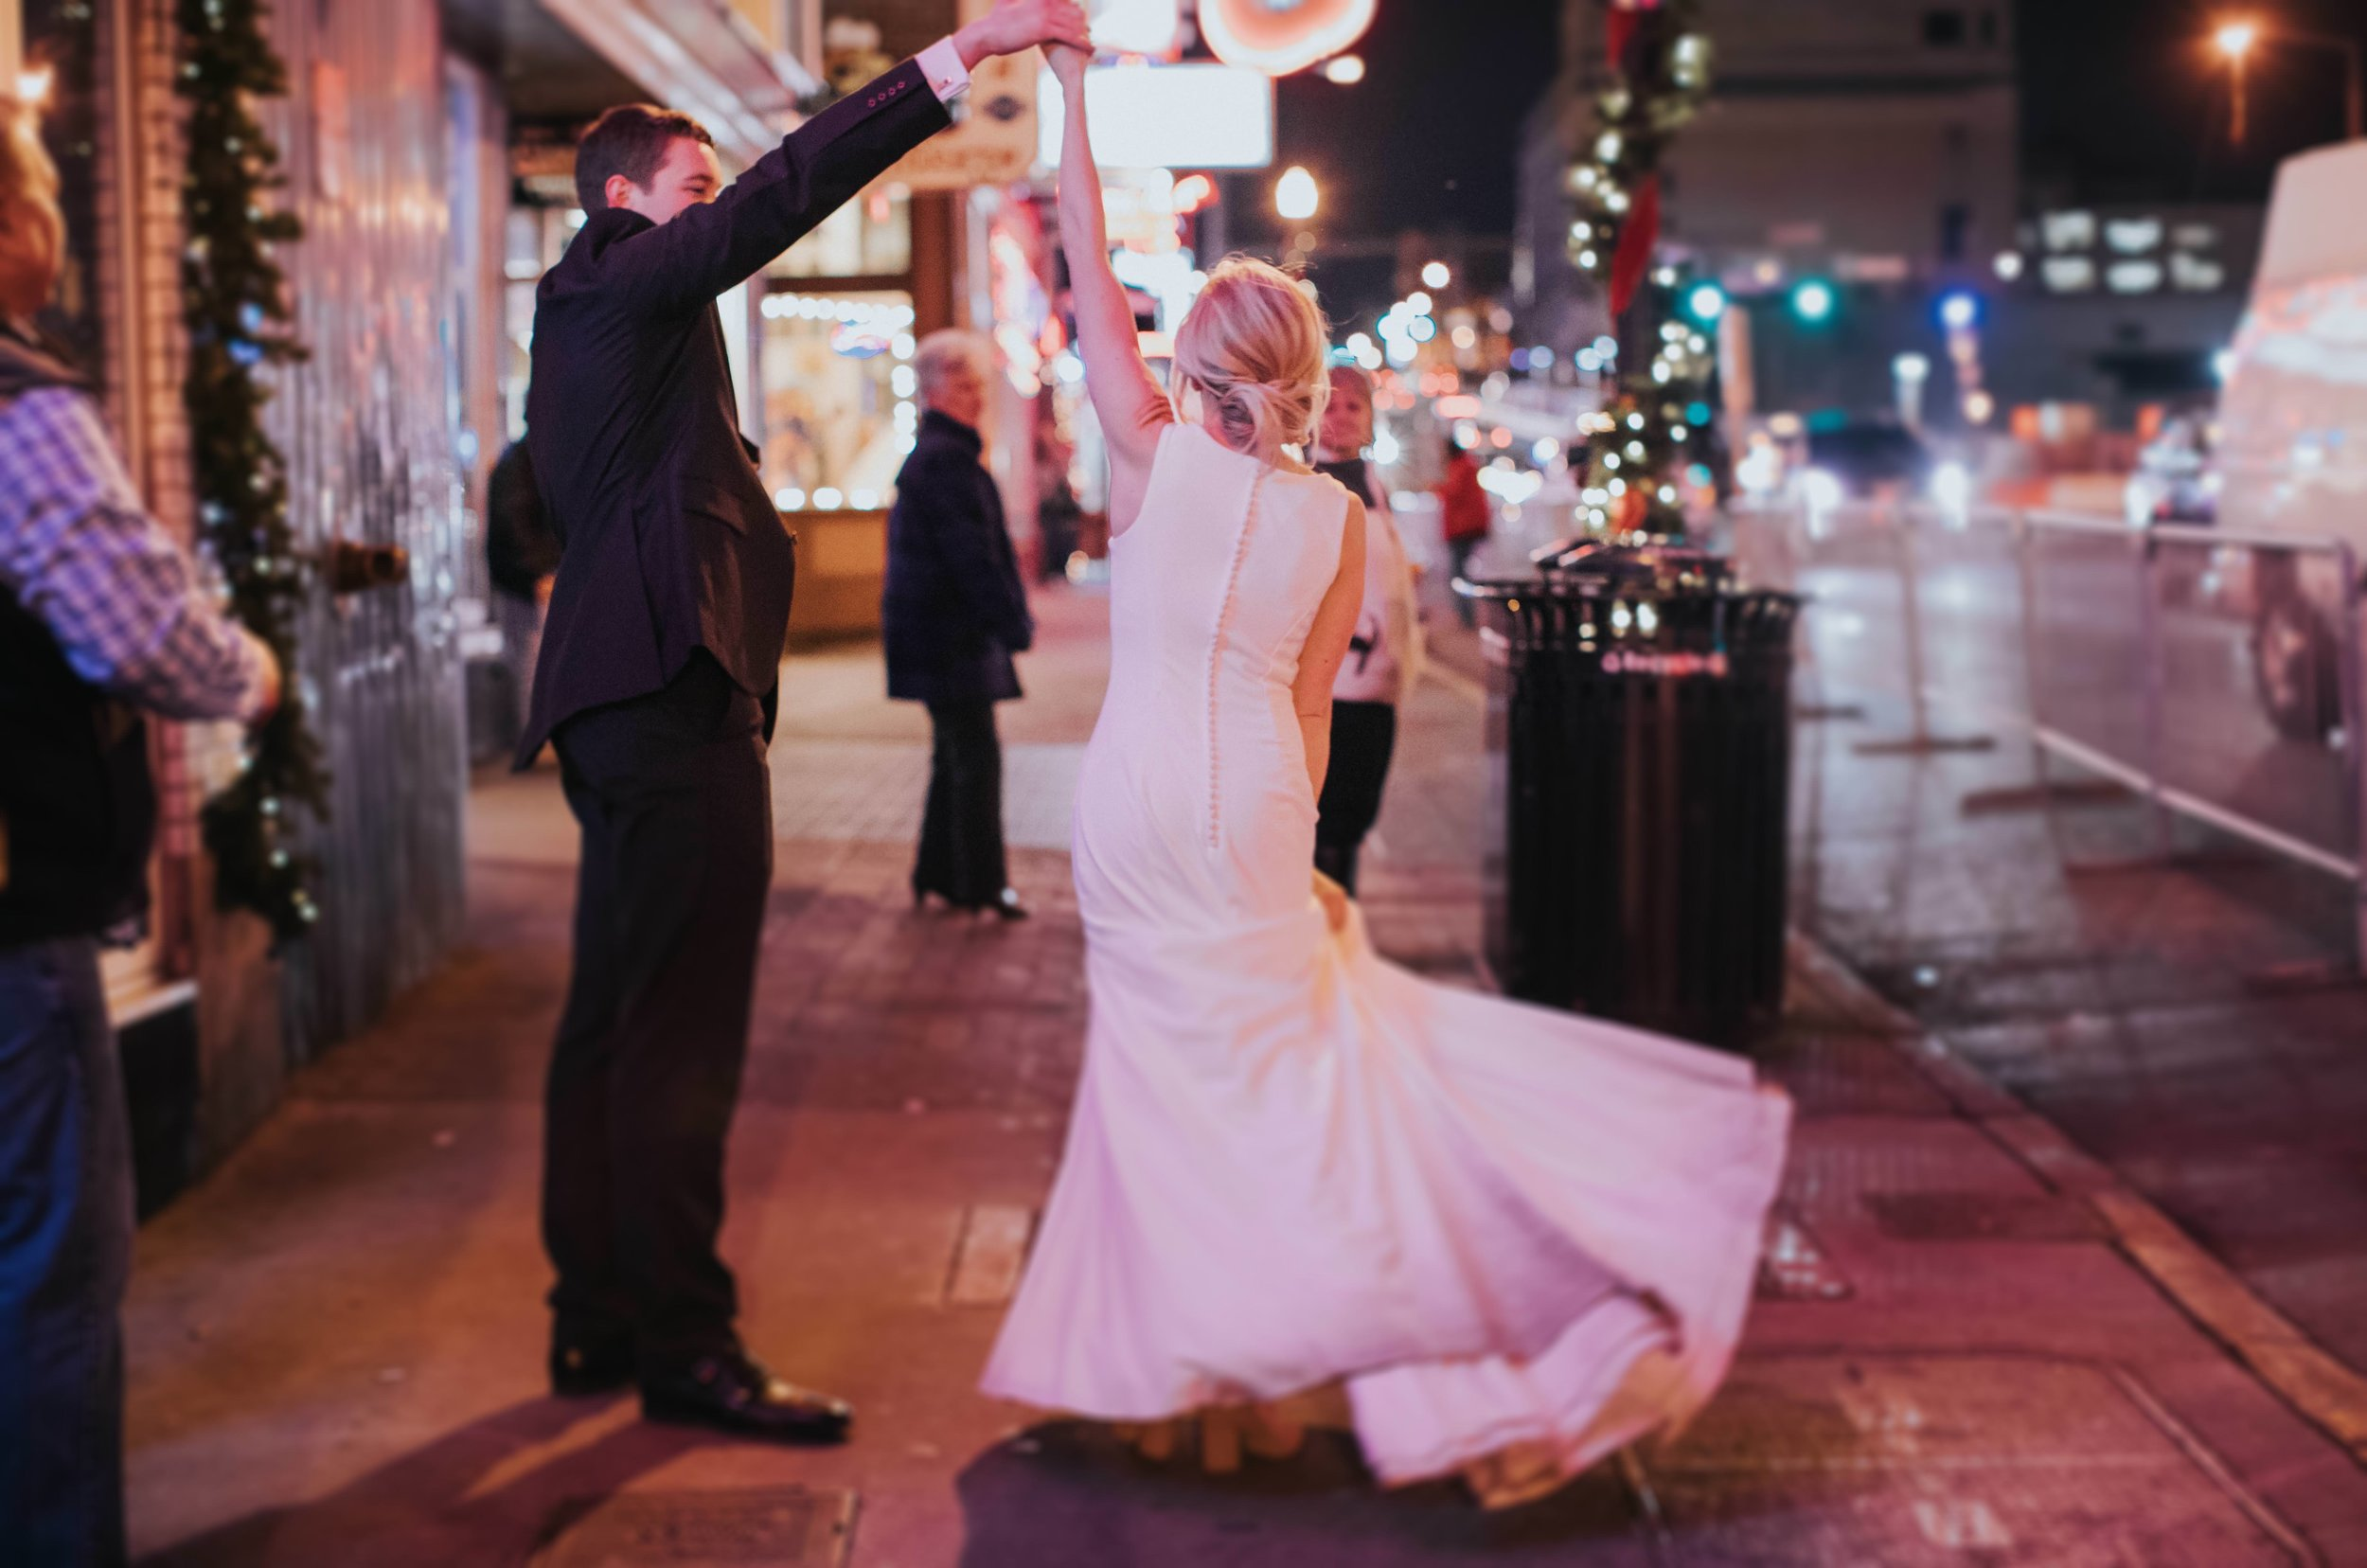 Charis_Lauren_Romantic_Wedding_Photographer_Nashville_03A0205.jpg